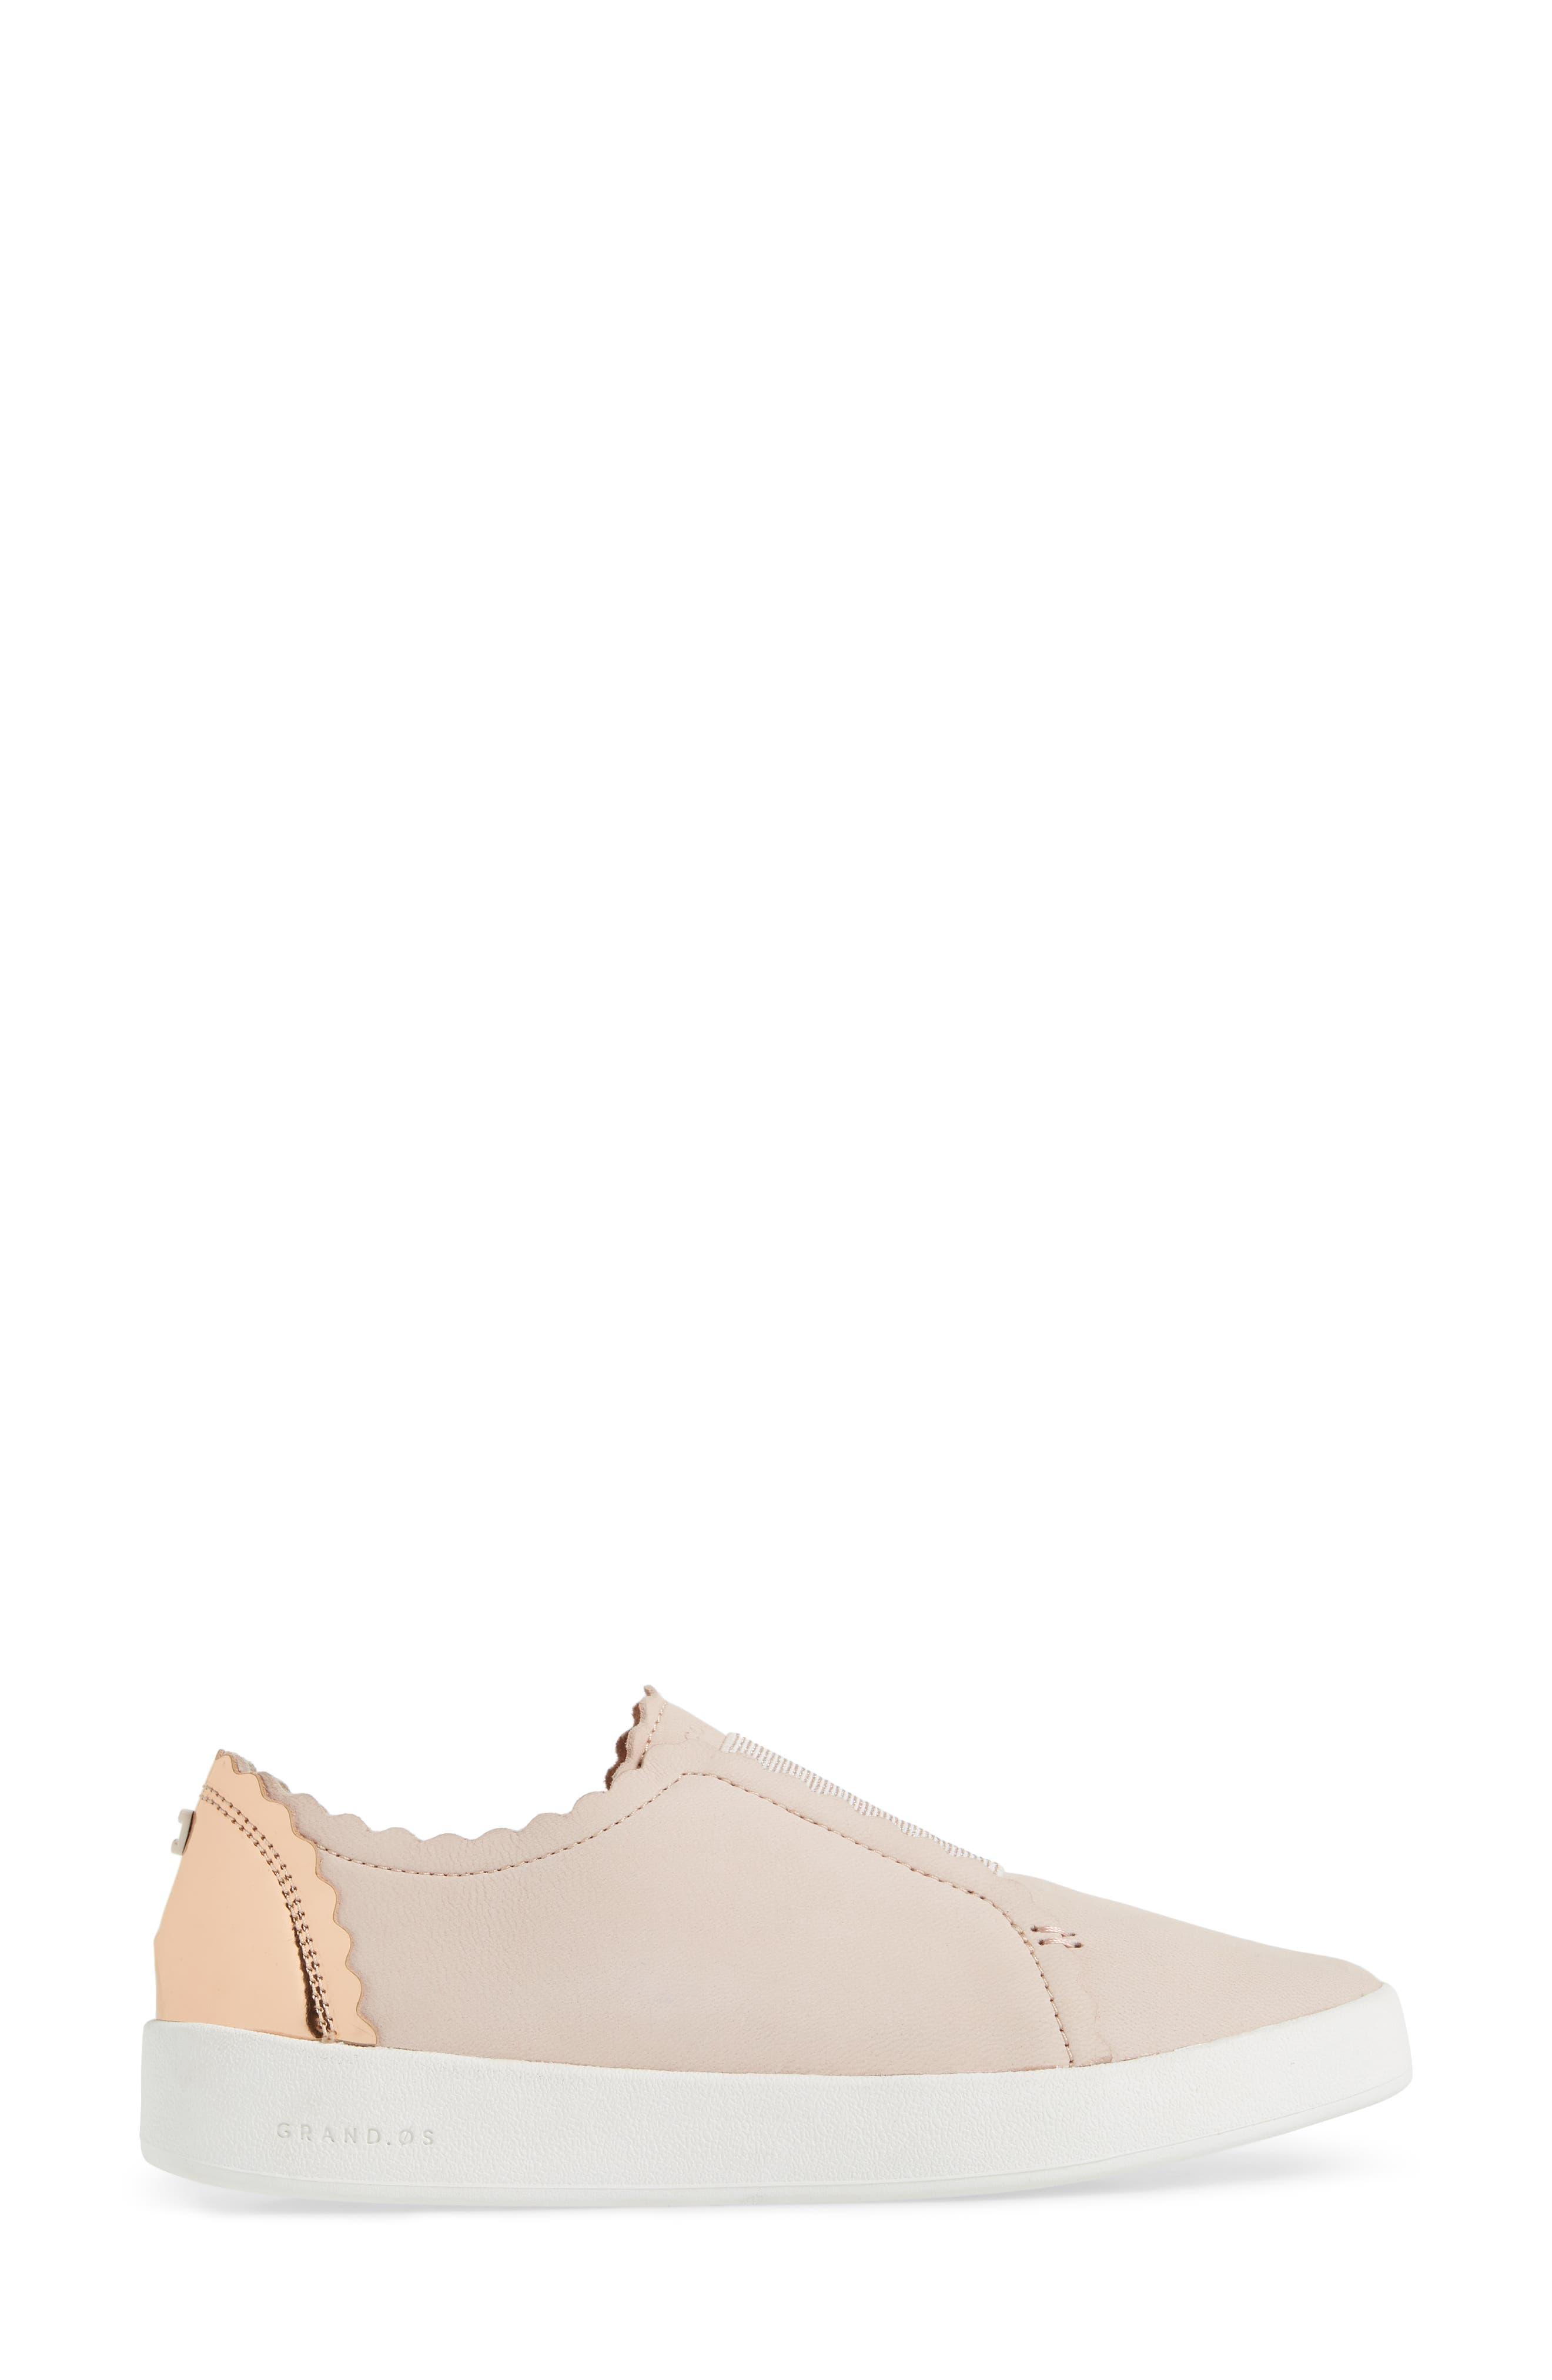 COLE HAAN, GrandPro Spectator Scalloped Slip-On Sneaker, Alternate thumbnail 3, color, PEACH BLUSH NUBUCK